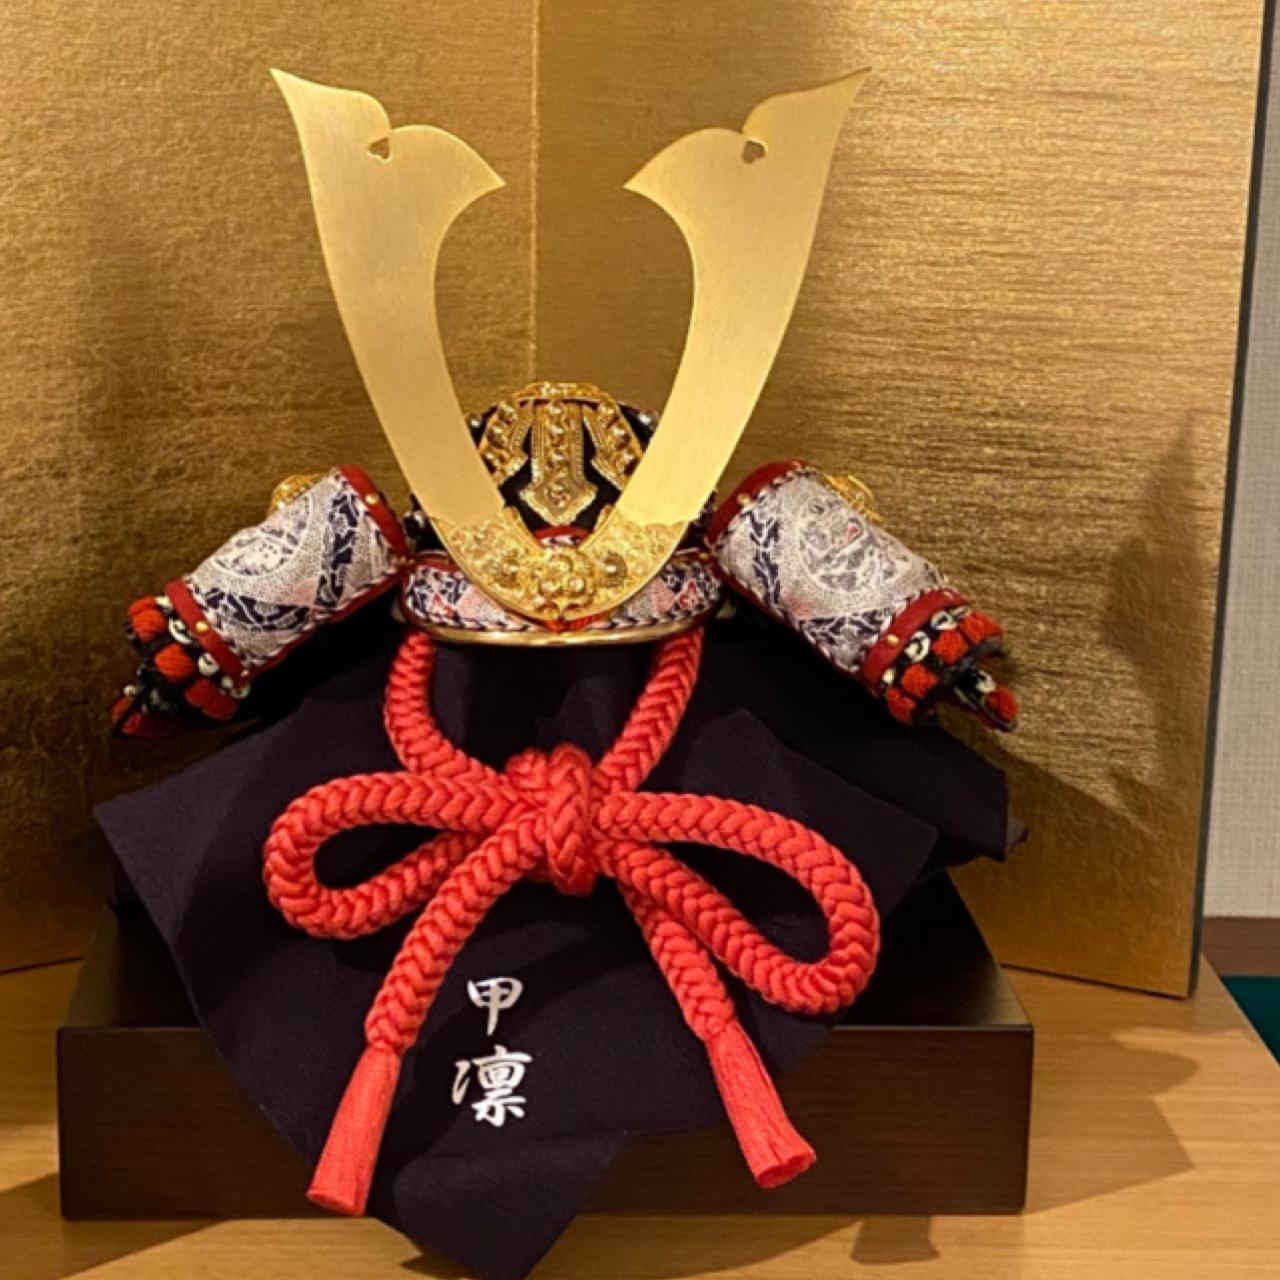 Kirarapost Powered By ママガール